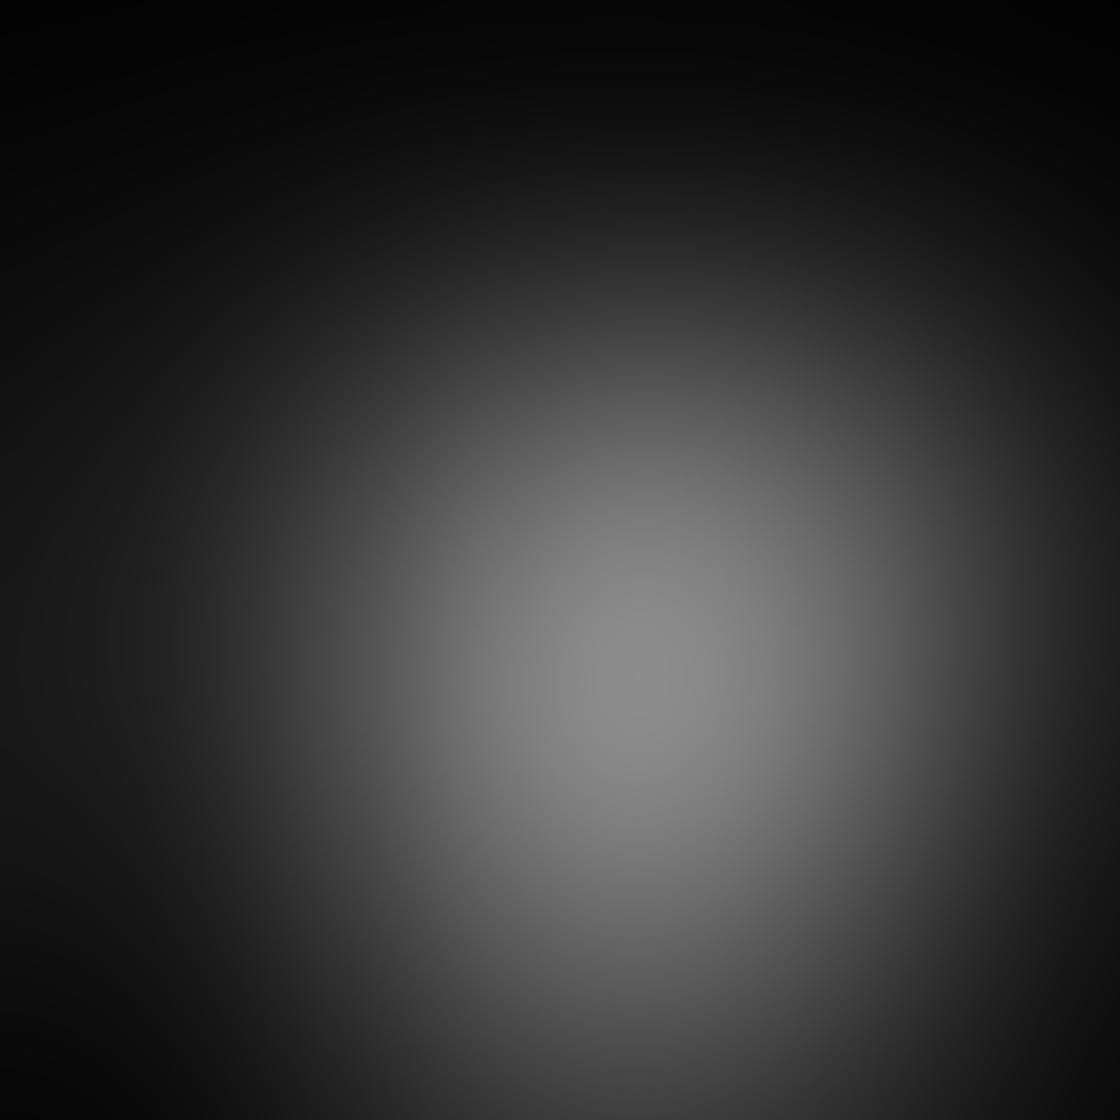 iPhone Silhouette Photos 19